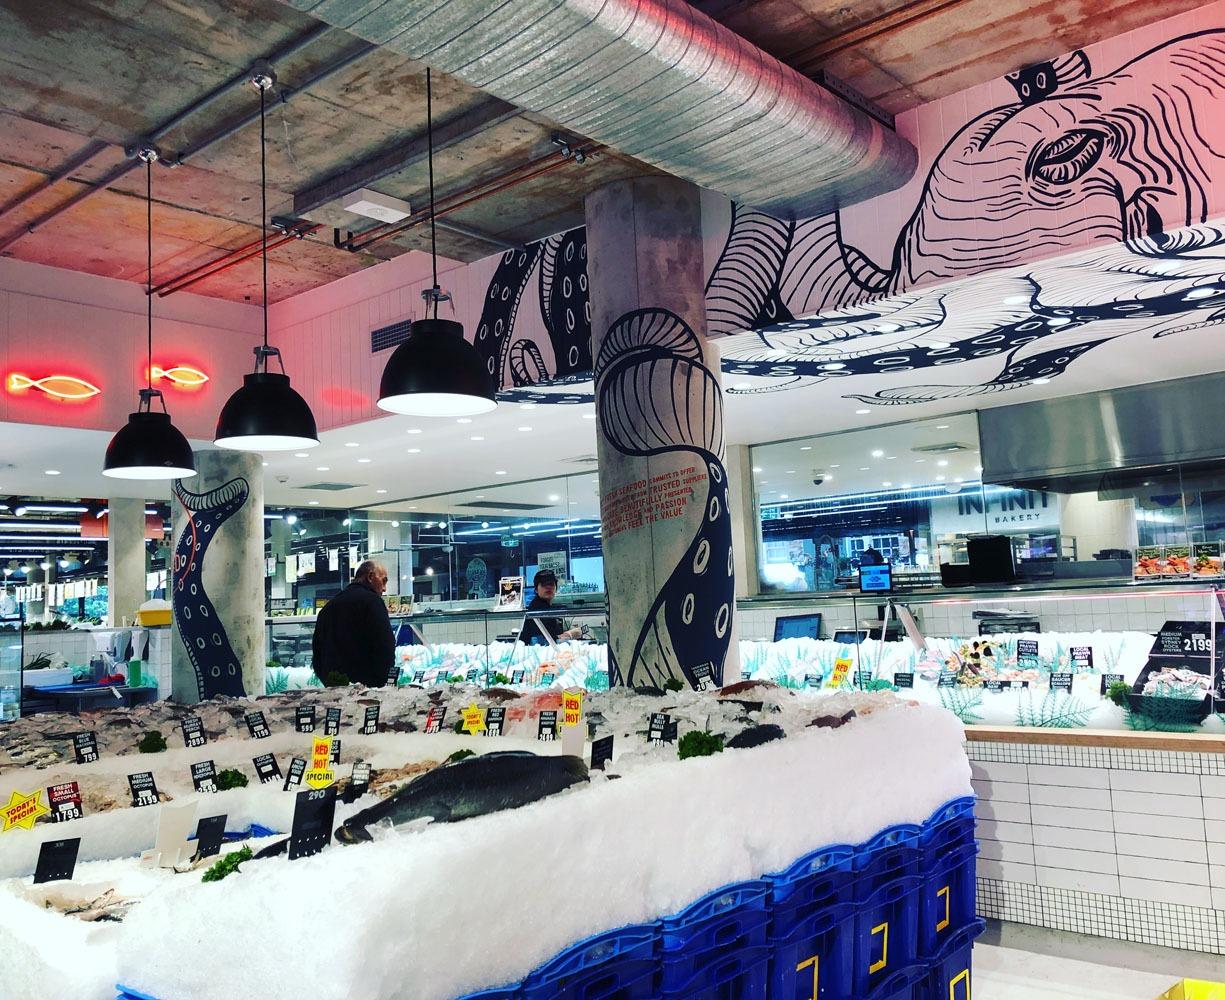 the-art-of-wall-sydney-fresh-seafood-harris-farm-lindfield-octopus-mural-6